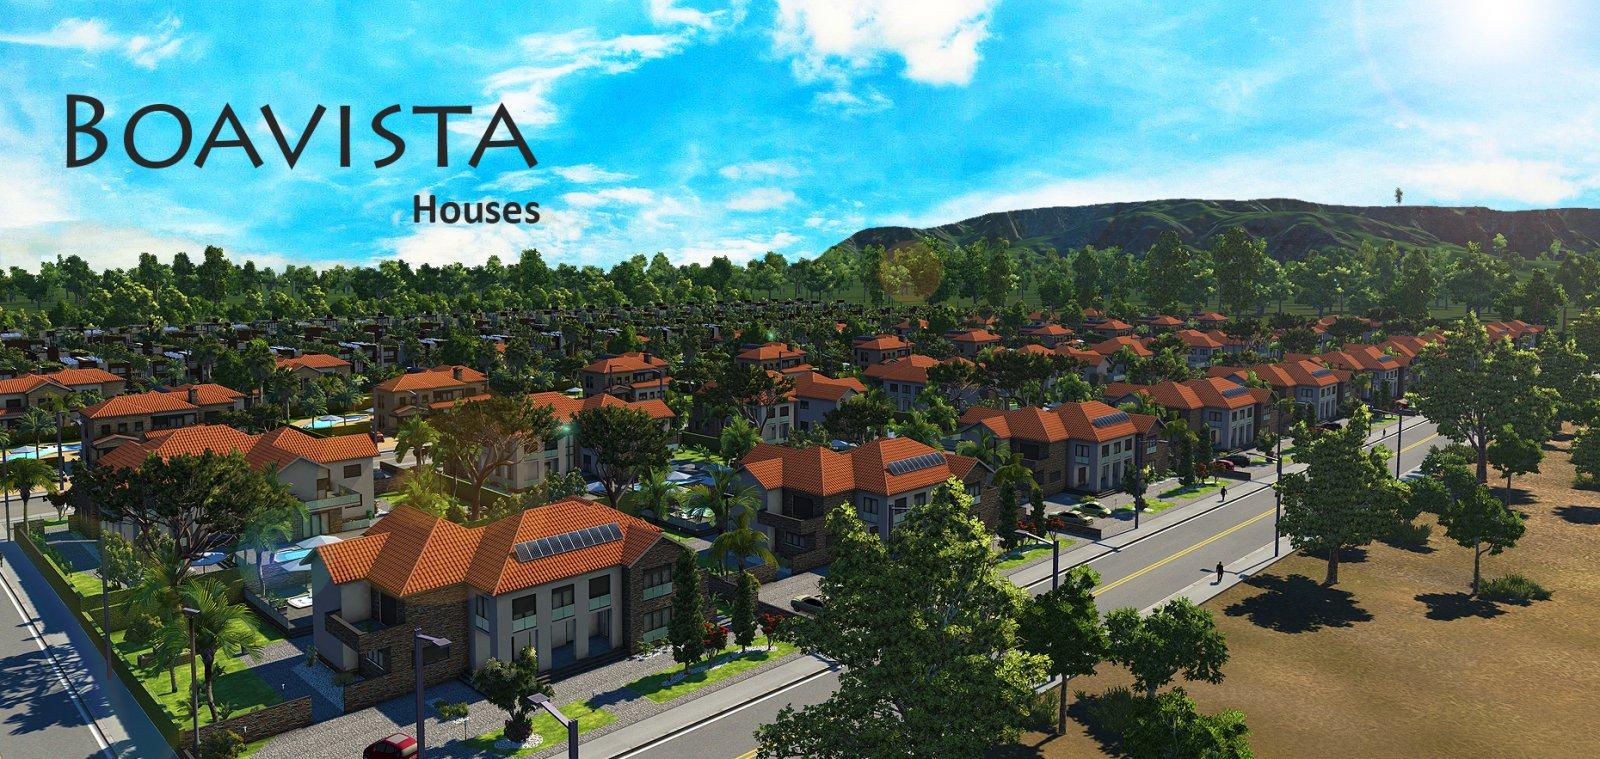 boavista houses_1.jpg